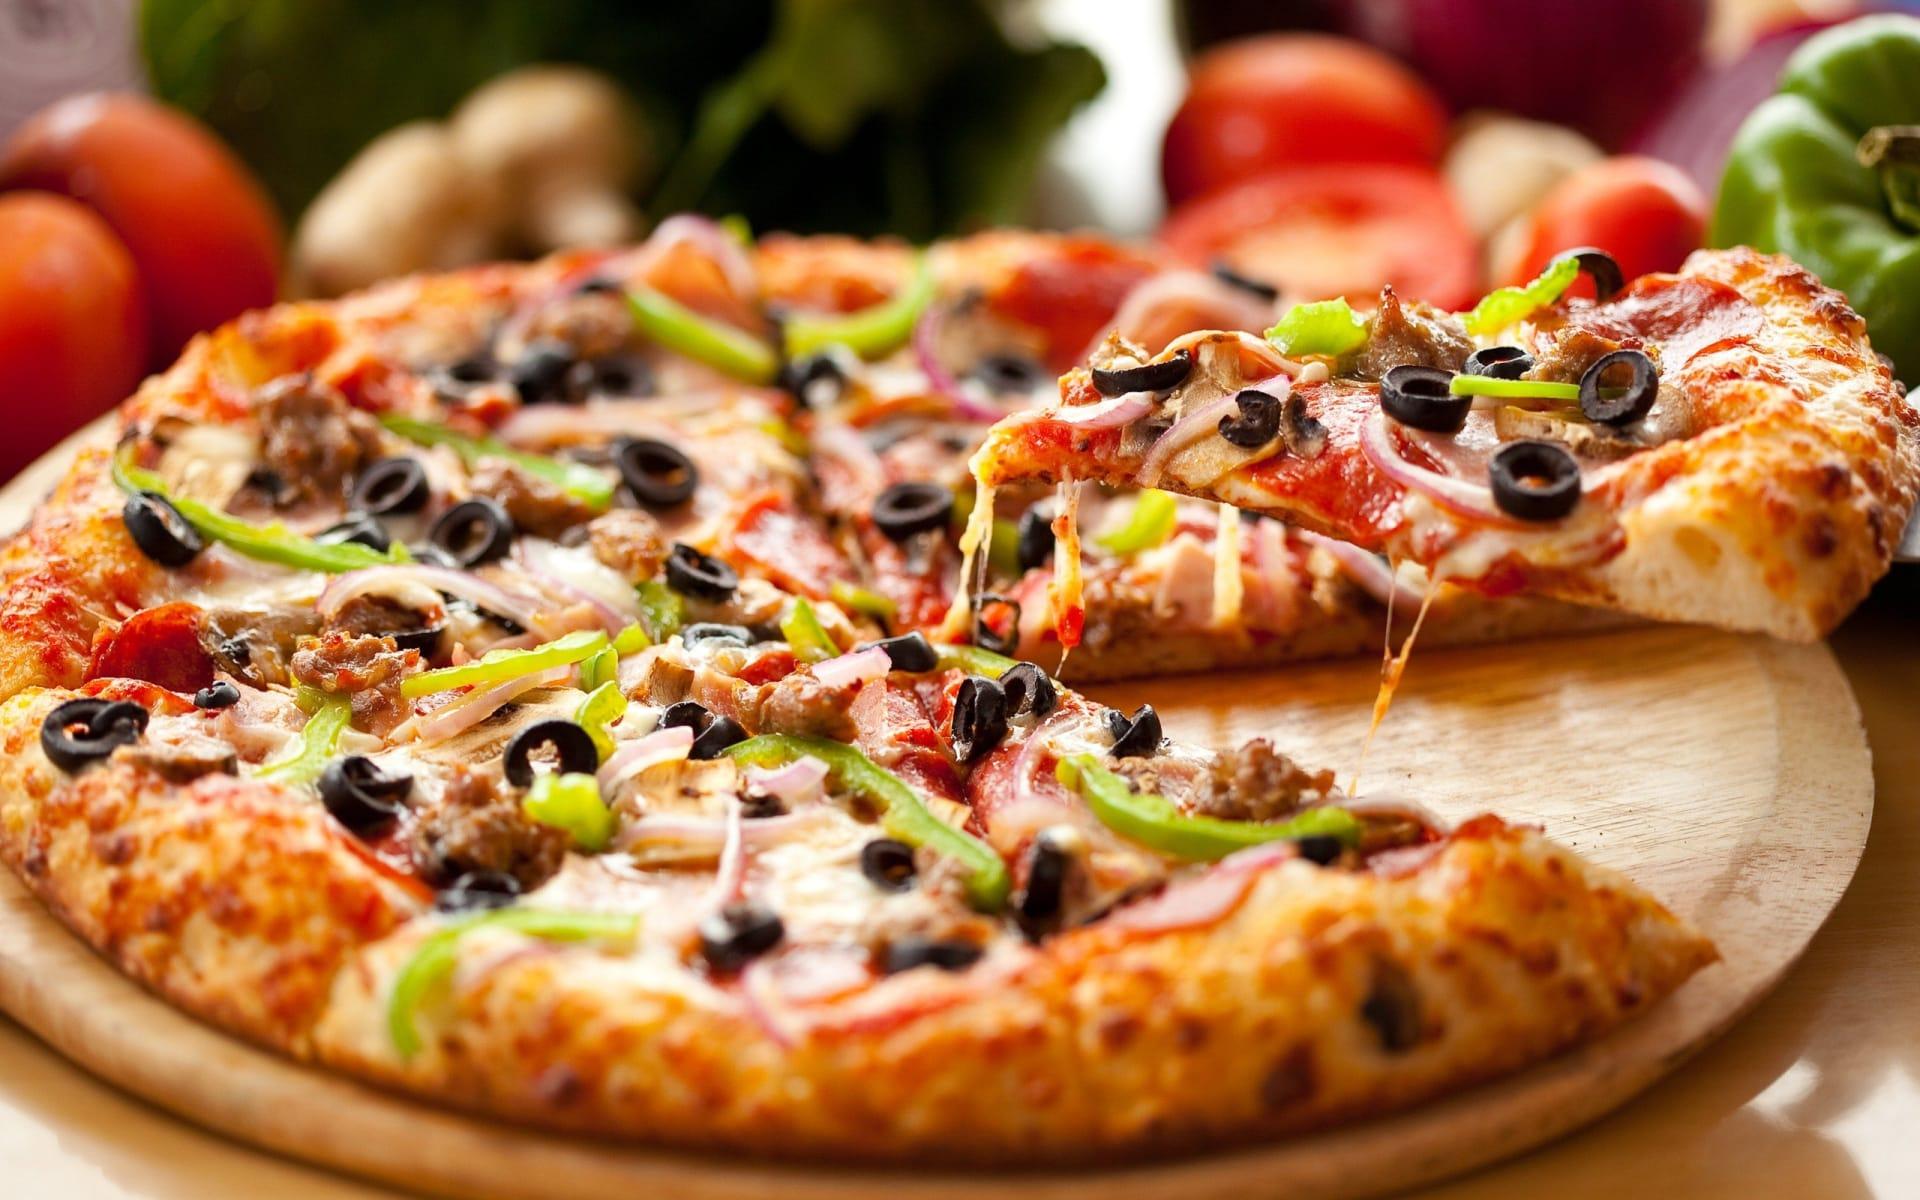 Mike's Pizza & Deli Station